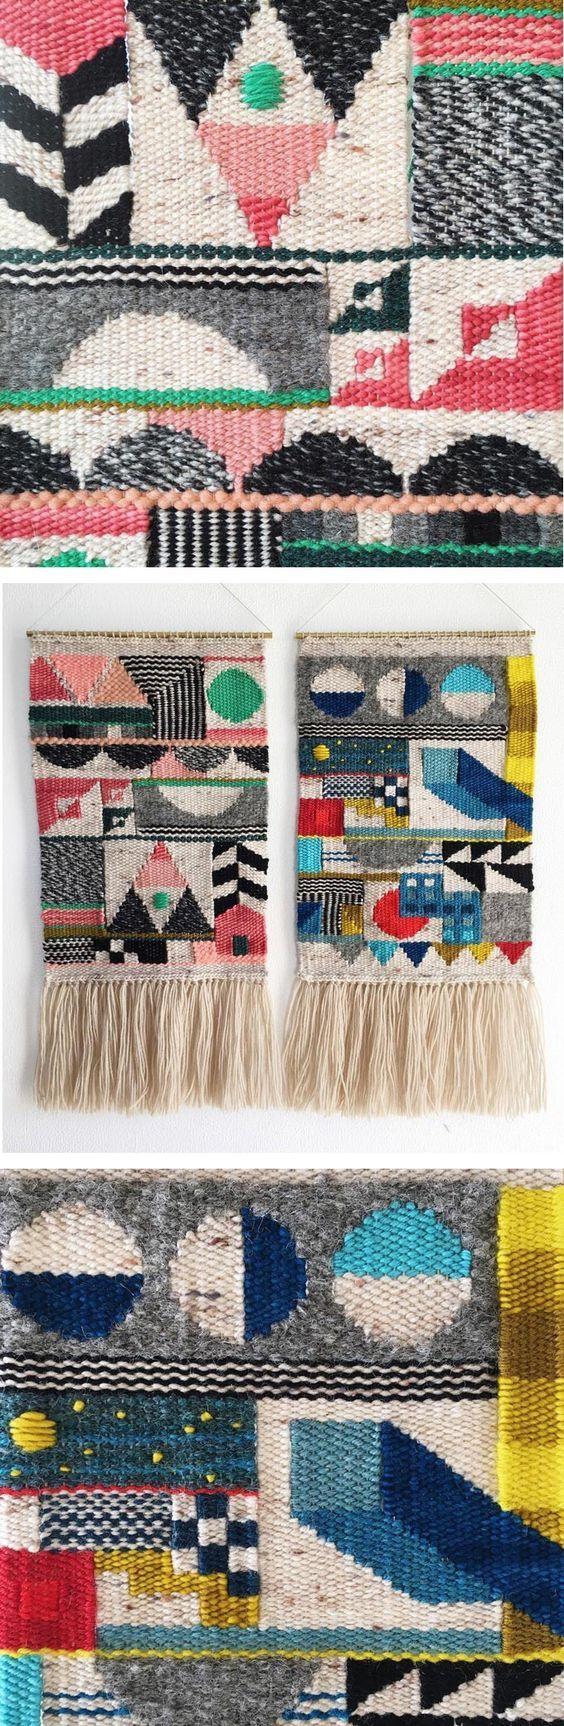 Weaving pattern GOALS!!